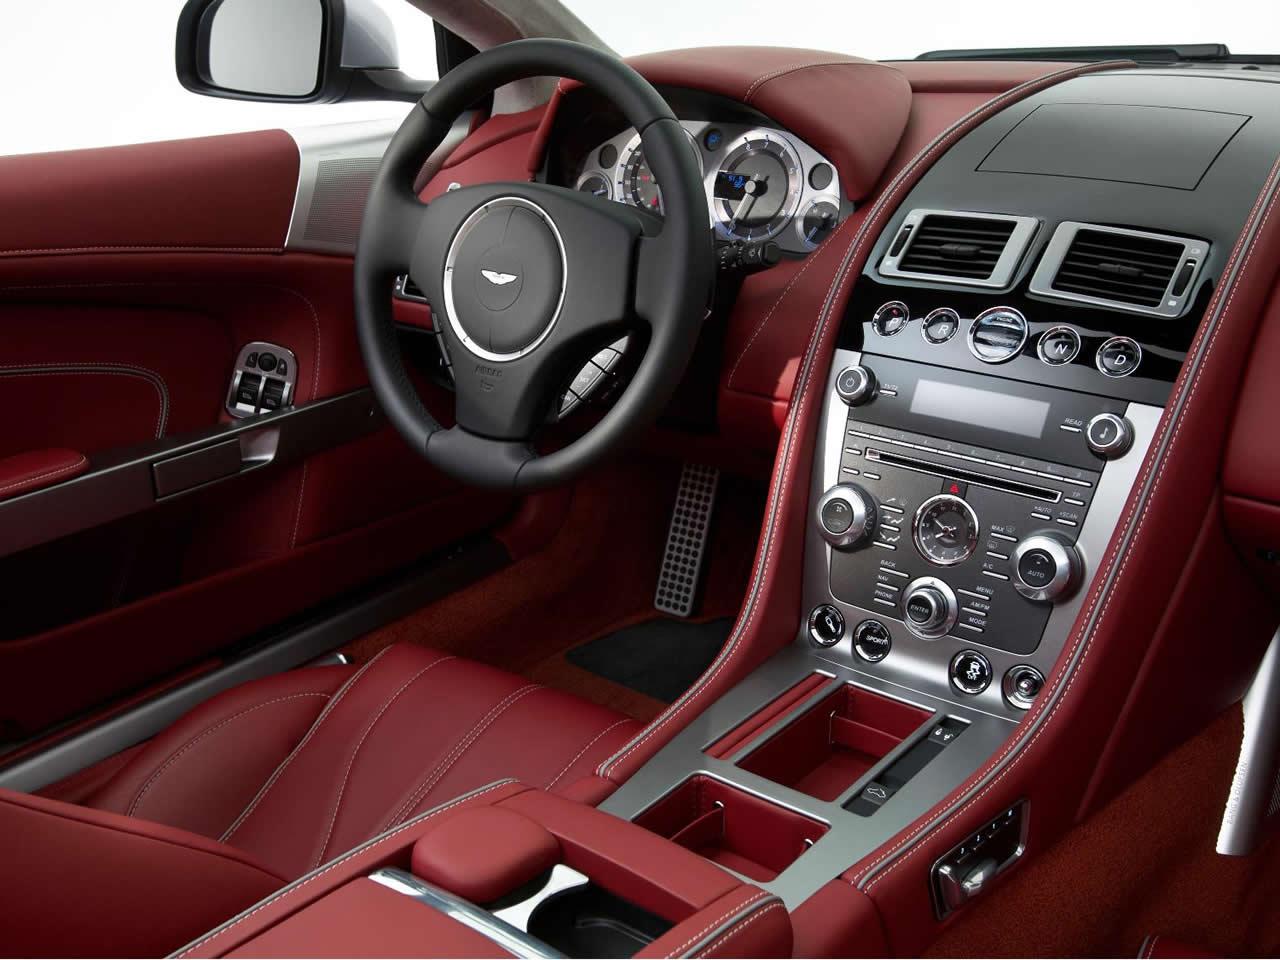 Aston Martin DB Volante Buying Guide - Aston martin db9 volante price